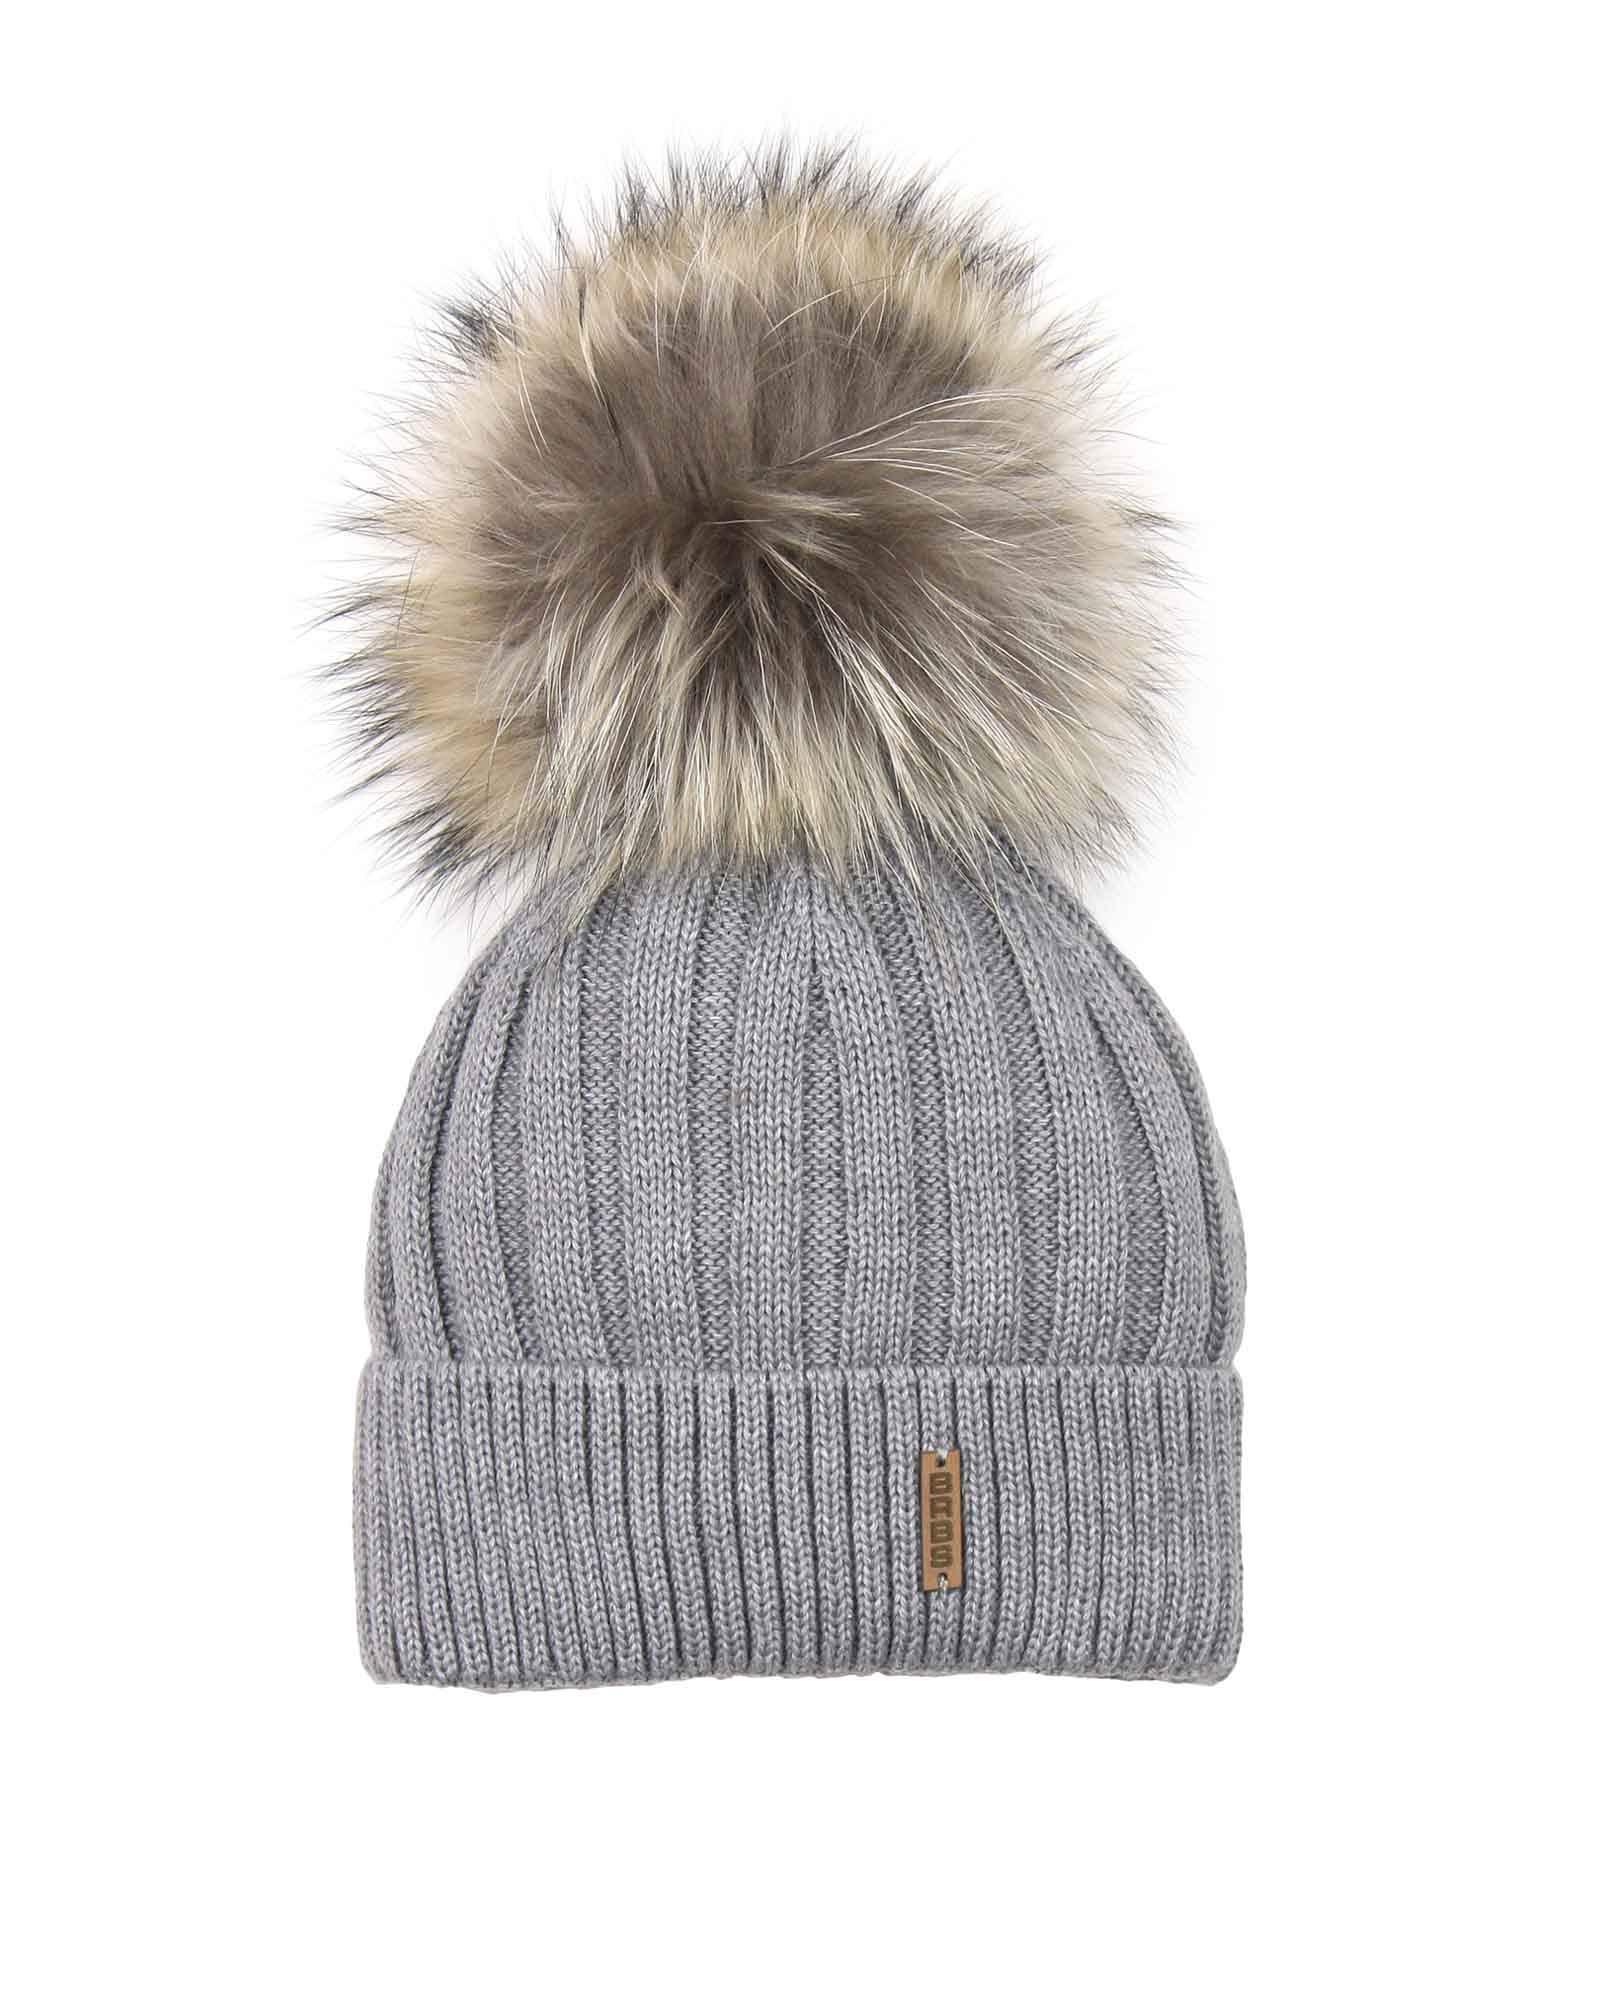 Barbaras Boys' Wool Beanie Hat in Grey with Racoon Pompom, Sizes 2-10 - 52-54